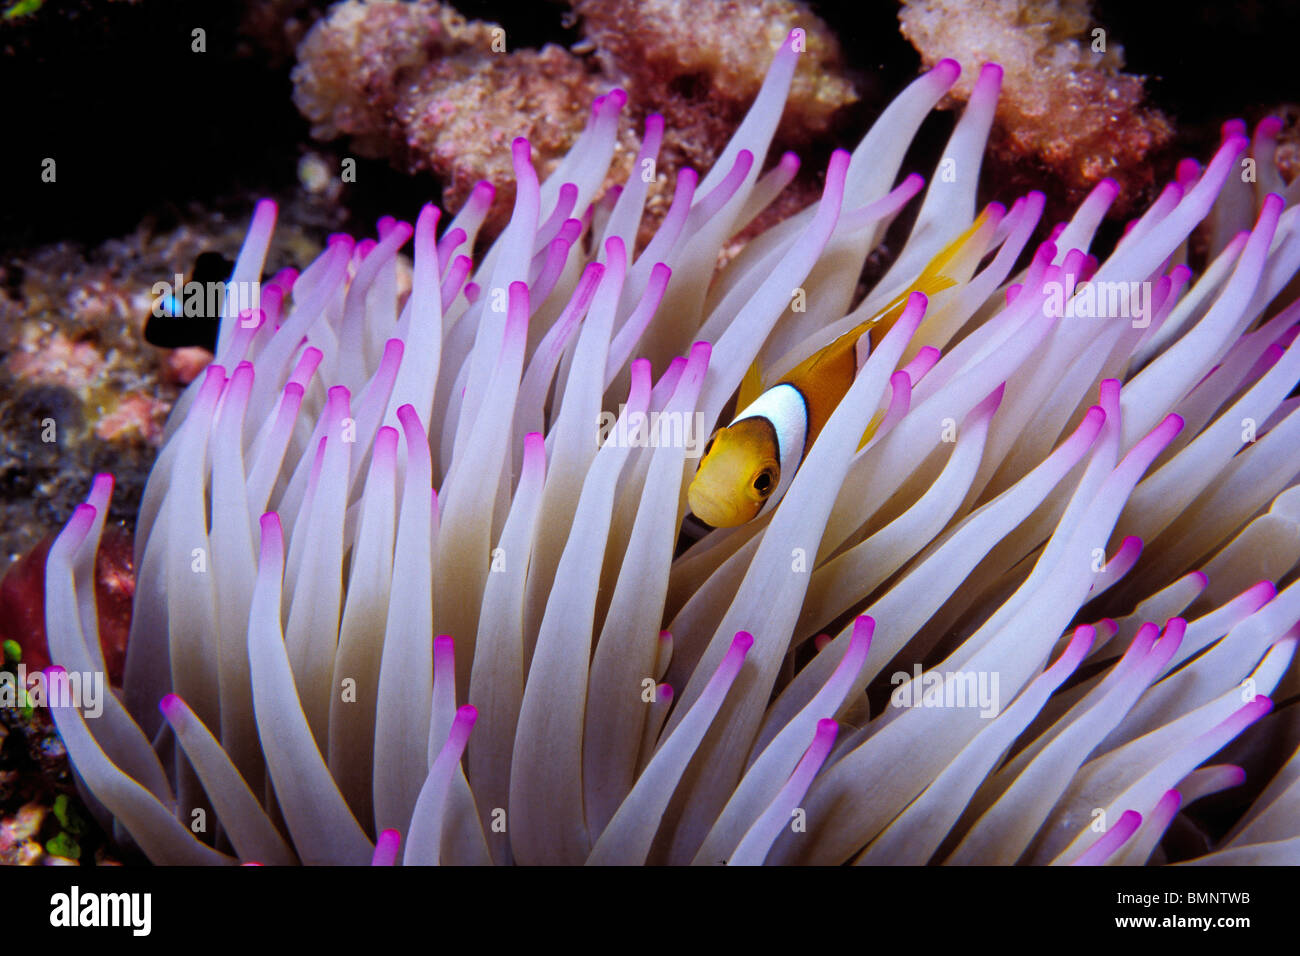 Clown anemonefish, Amphiprion percula, Tuamotus, French Polynesia, Pacific Ocean Stock Photo